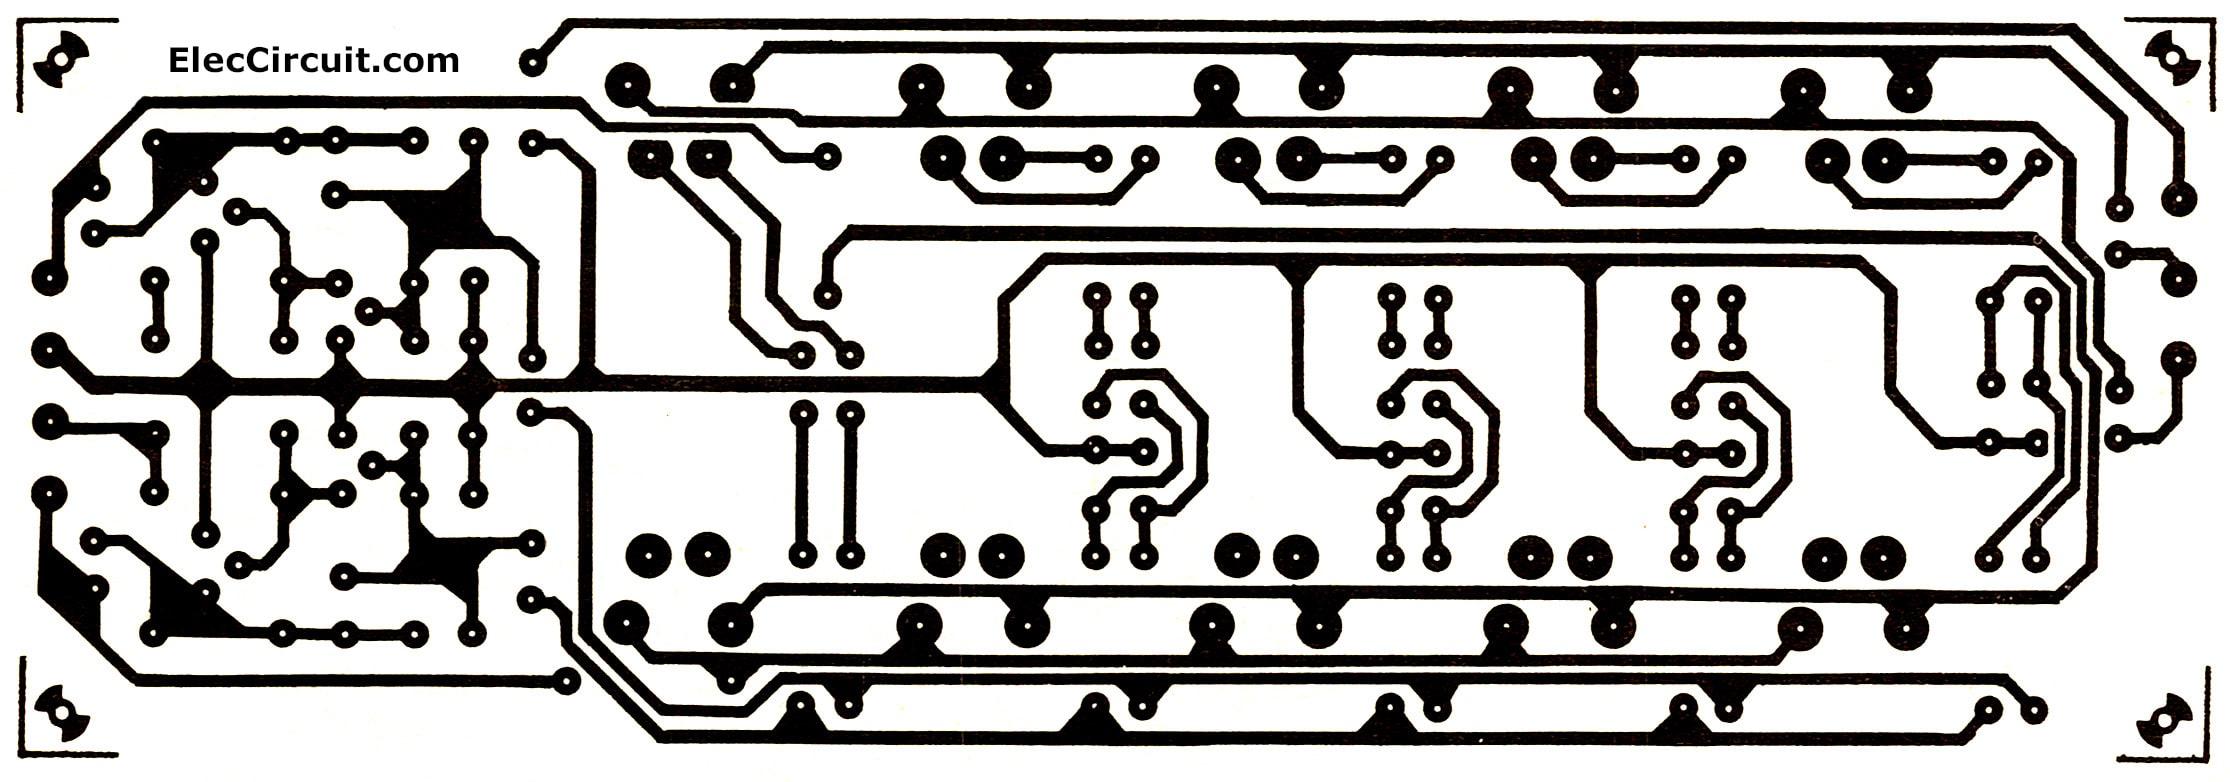 pre amplifier with transistors bc548